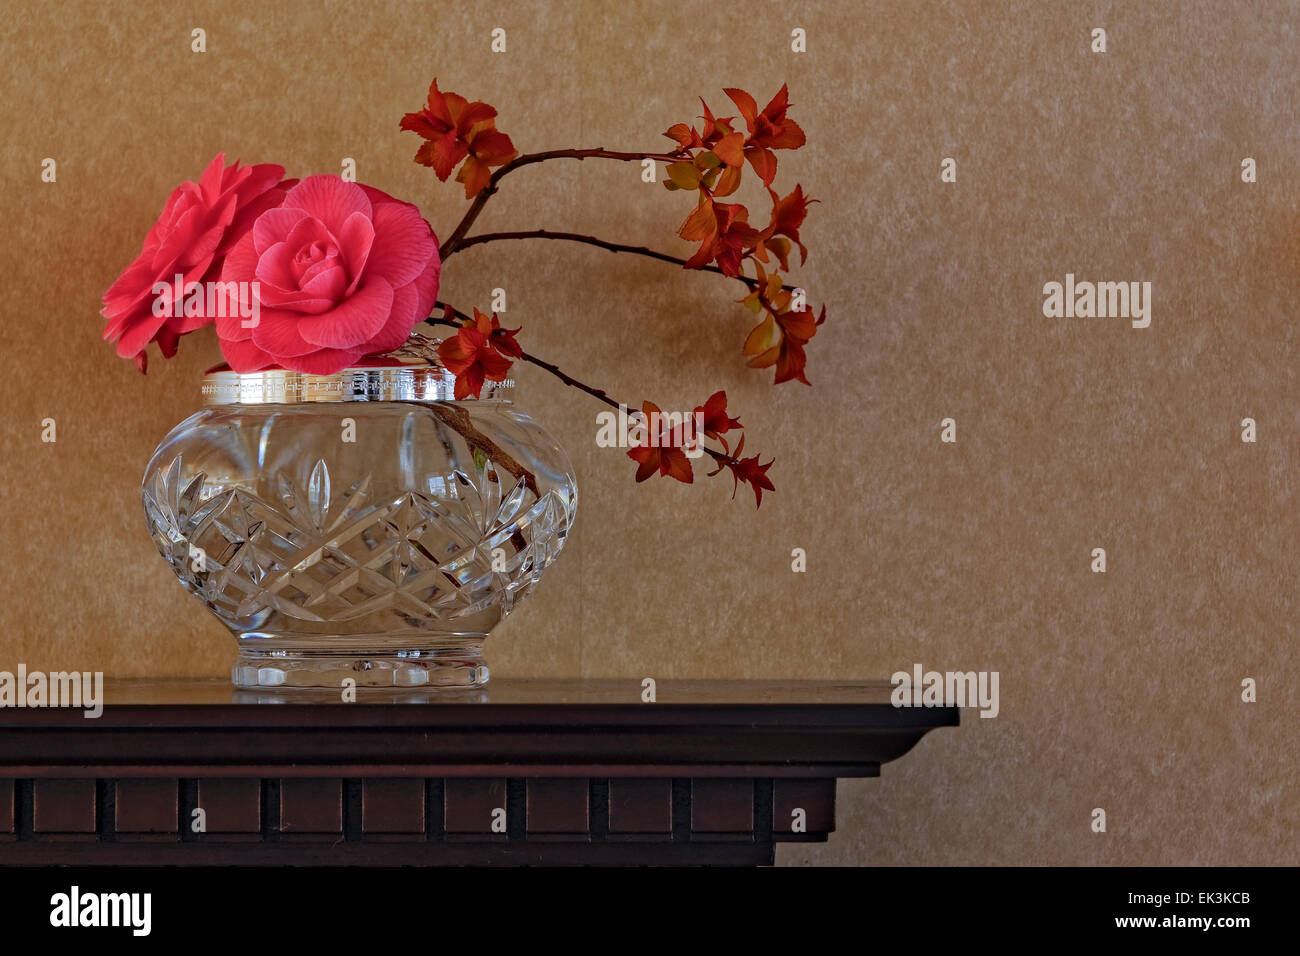 Flower Arrangement Including Camellia Flowers In Crystal Vase On Carved Wooden Mantelpiece Against Plain Wallpaper